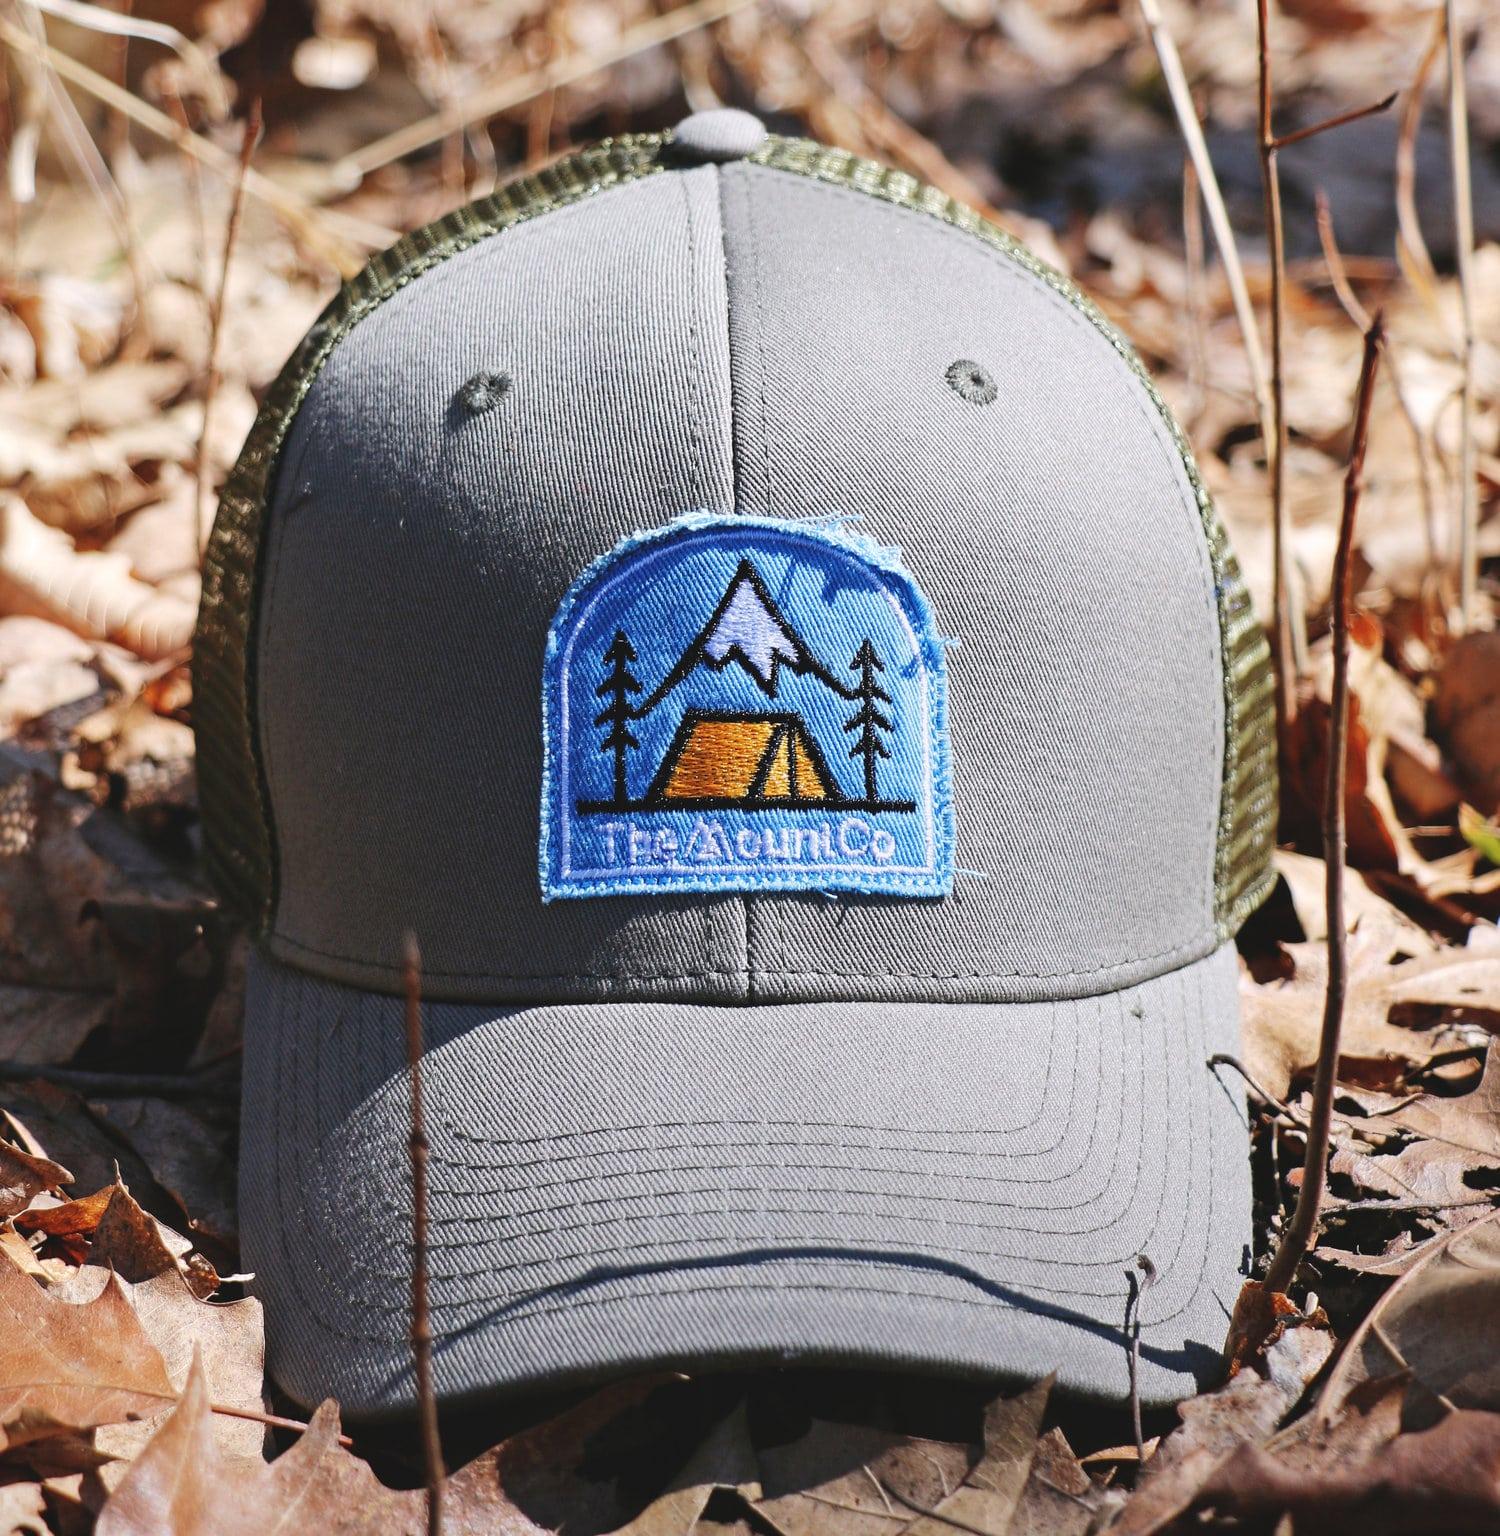 mount co hat